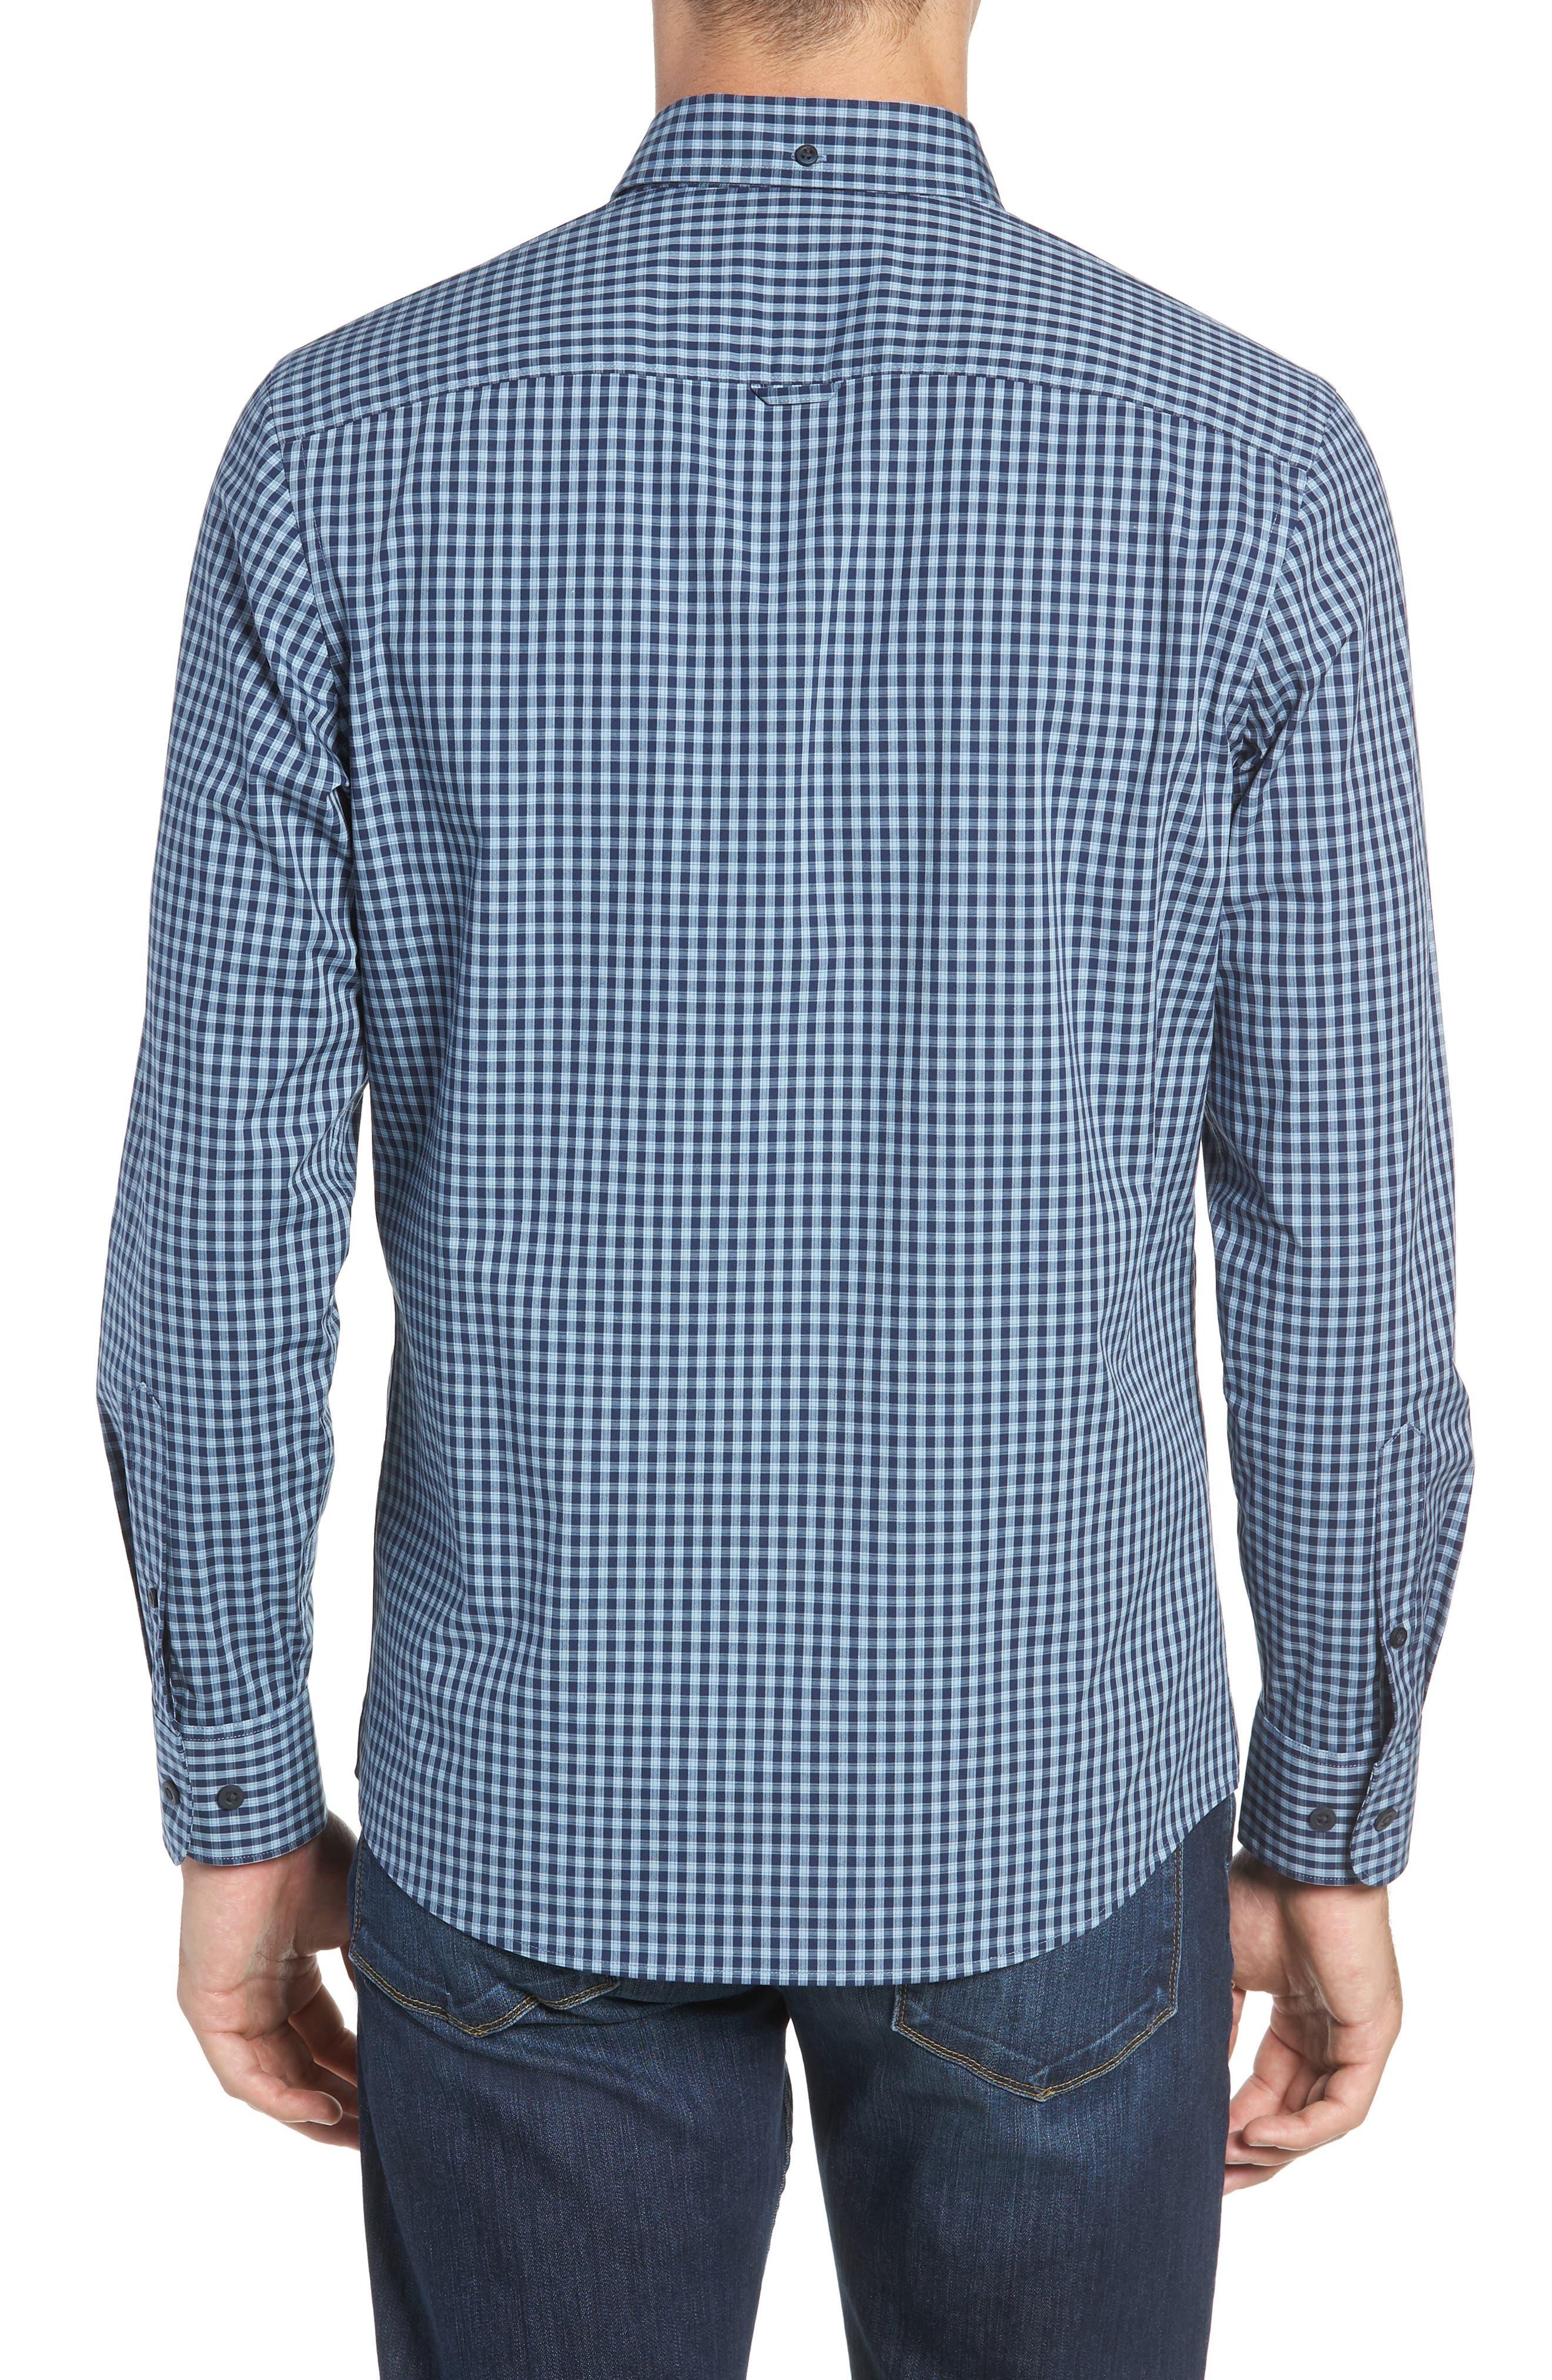 Tech-Smart Slim Fit Check Sport Shirt,                             Alternate thumbnail 3, color,                             NAVY NIGHT BLUE CHECK